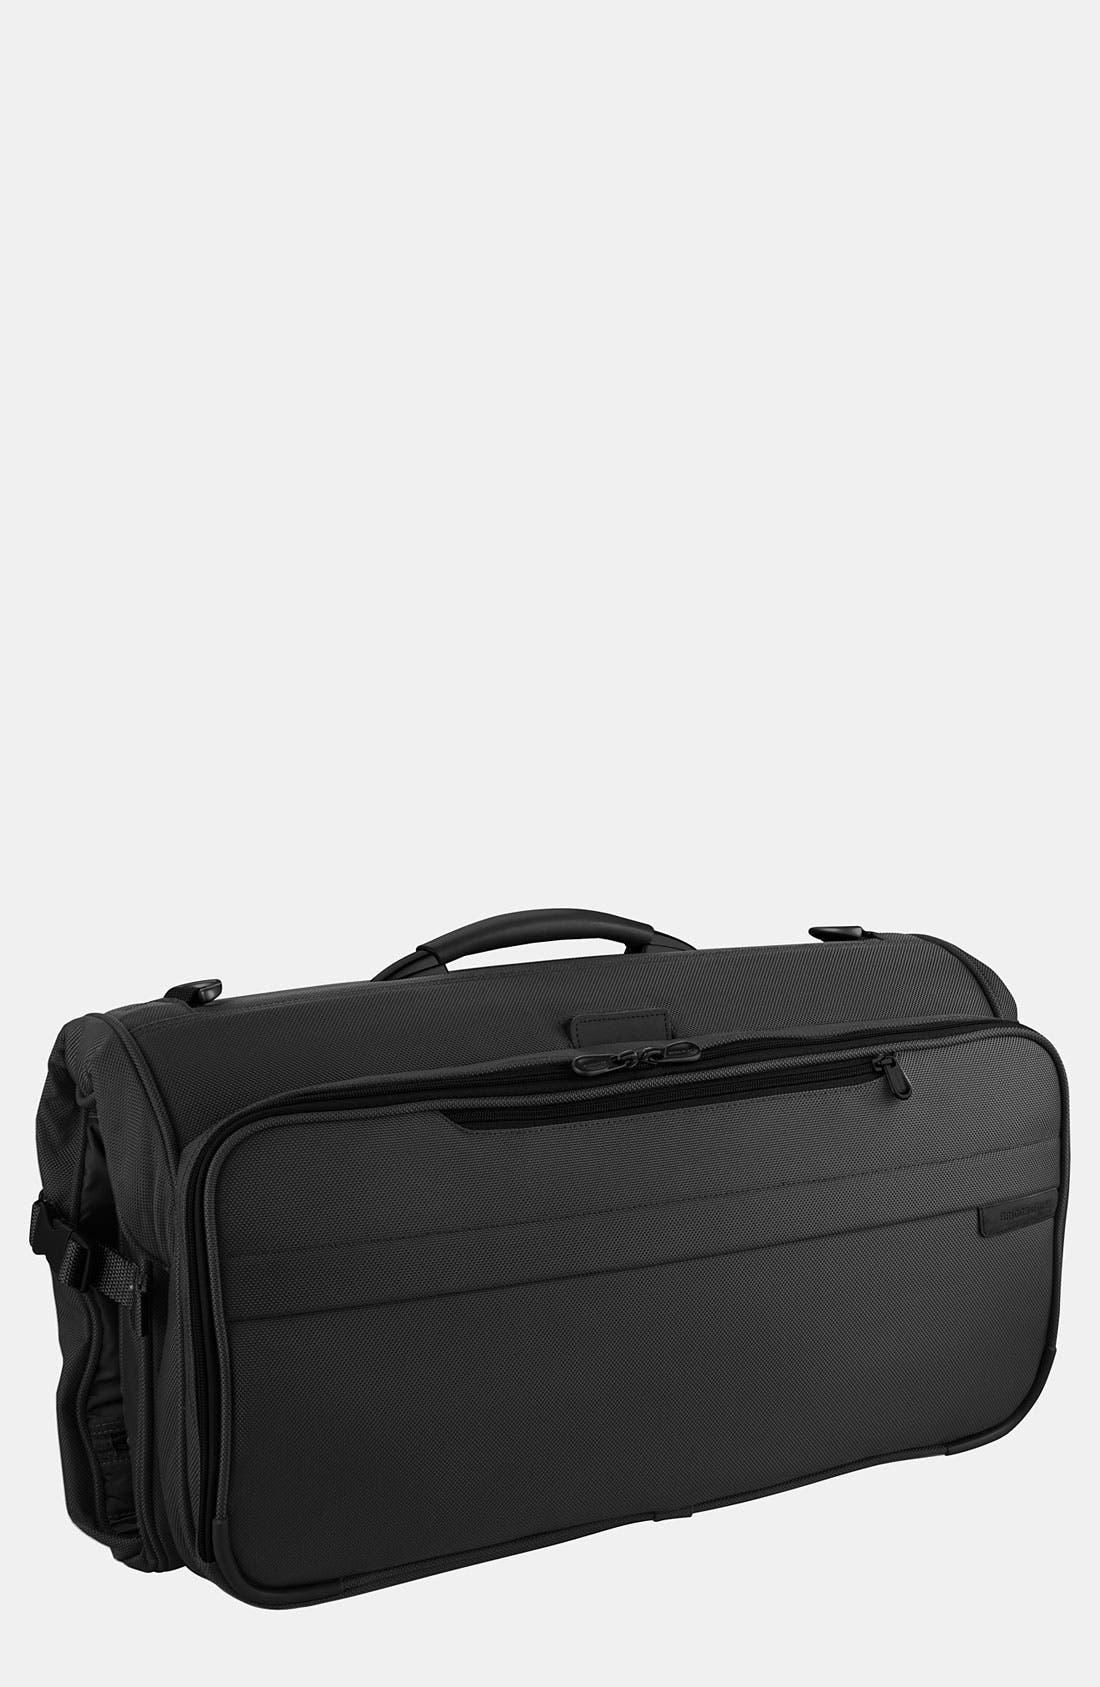 BRIGGS & RILEY, Baseline - Compact Garment Bag, Main thumbnail 1, color, BLACK